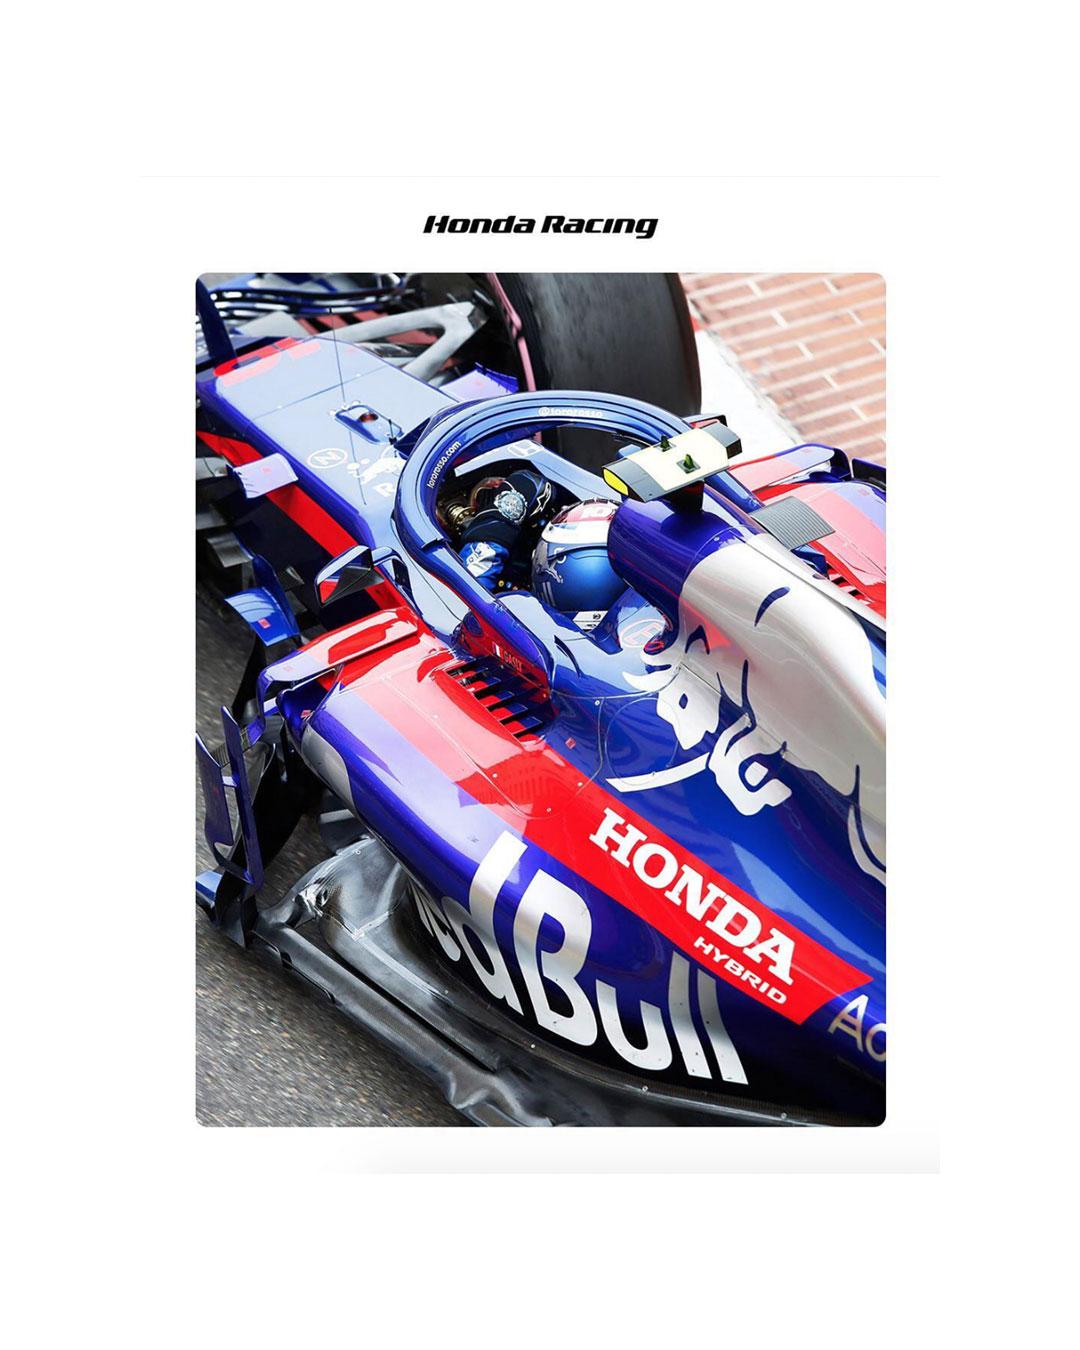 ary-and-joe-honda-formula-1-poster.jpg